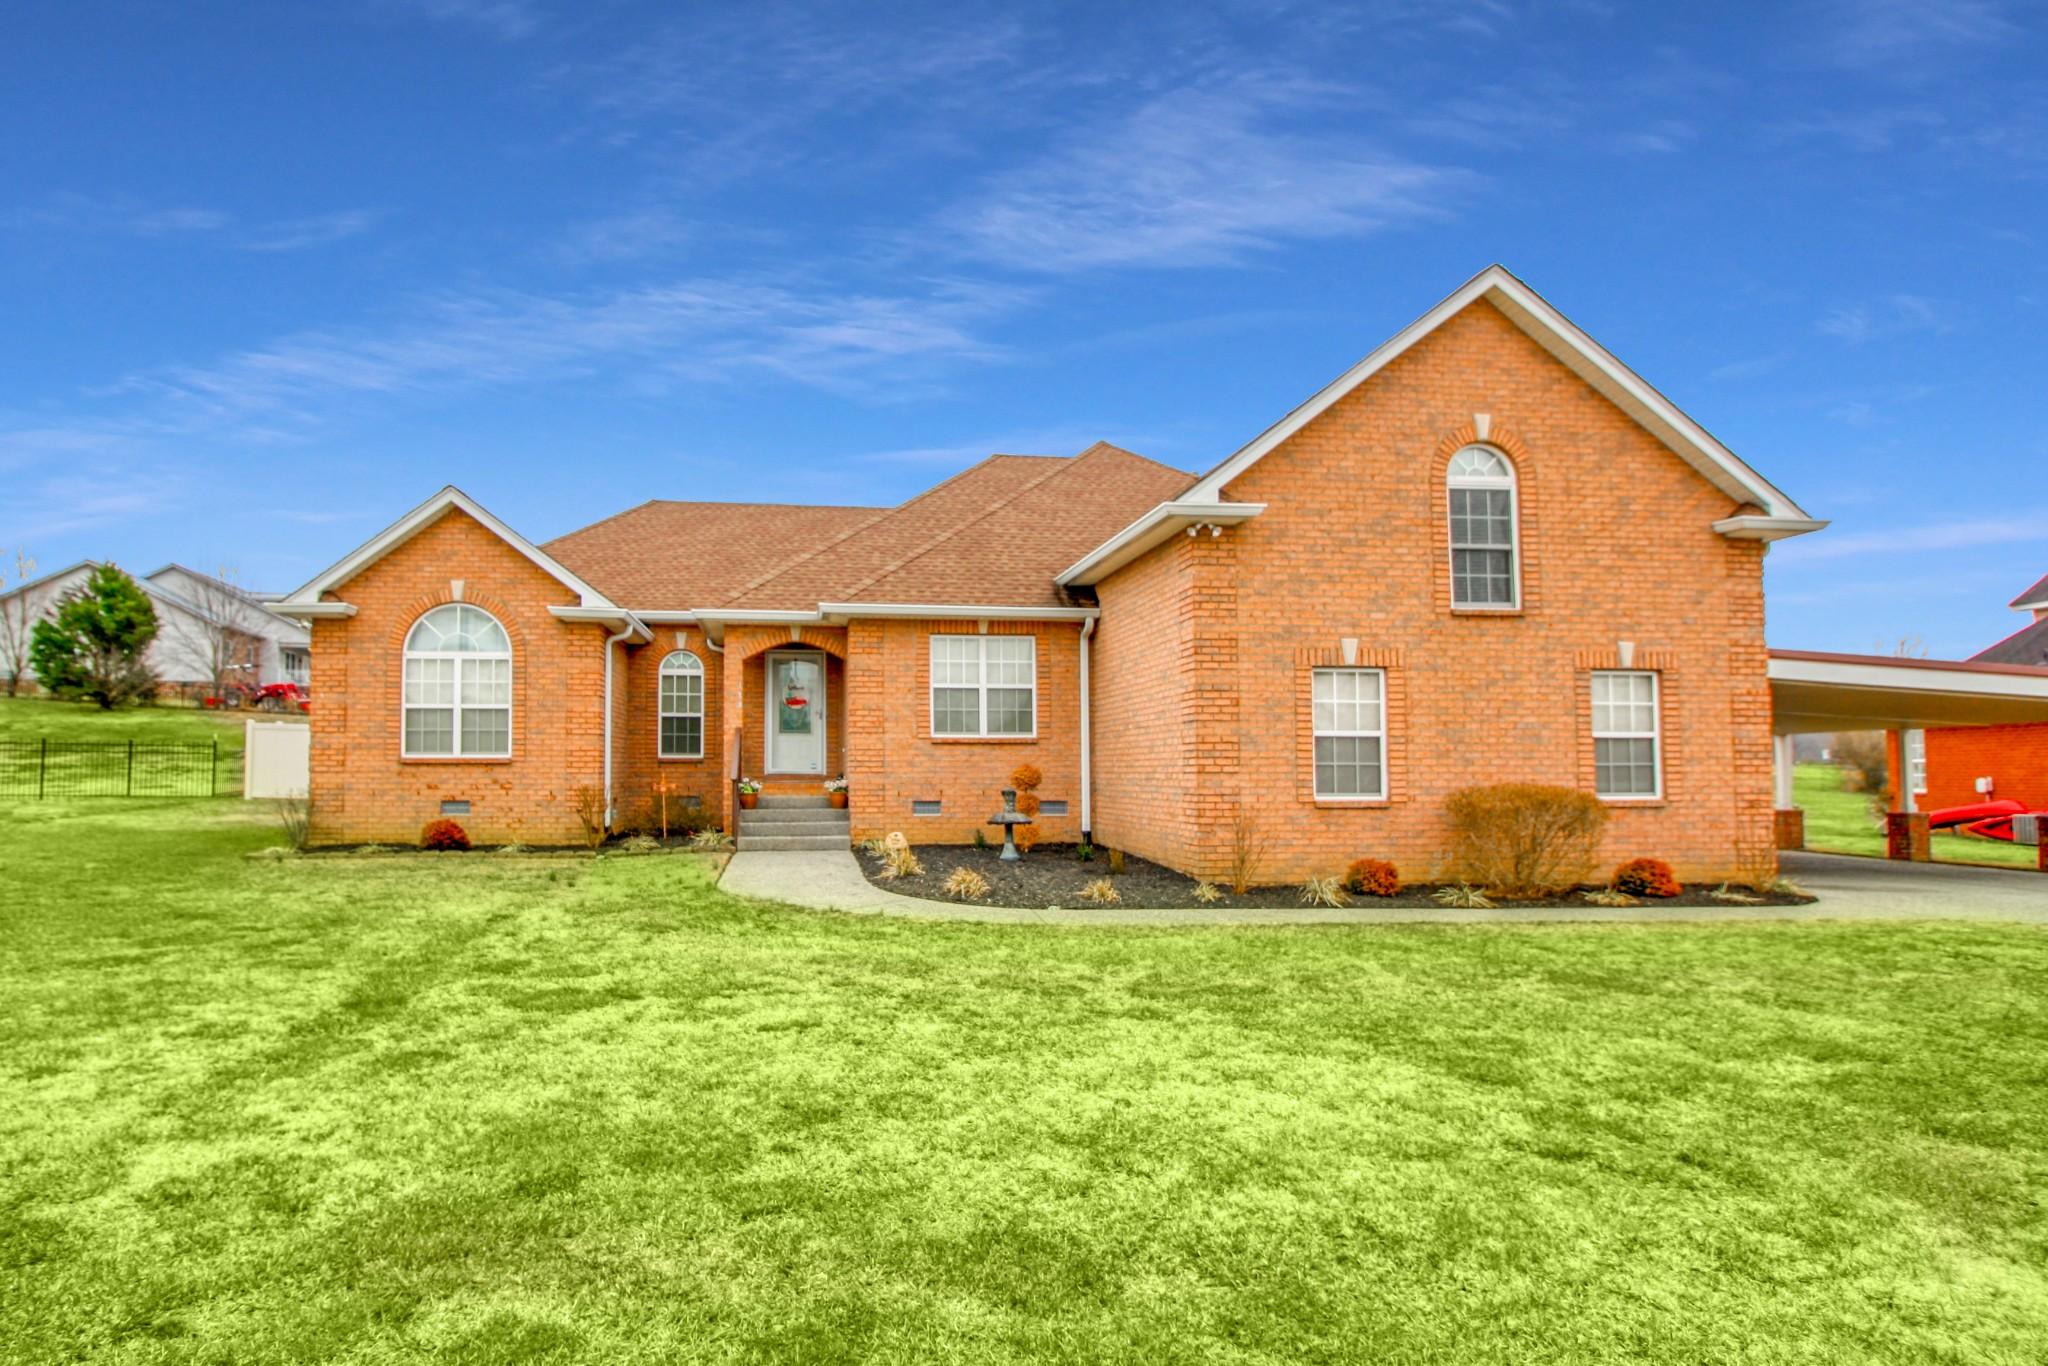 118 Tison Ln Property Photo - Cottontown, TN real estate listing